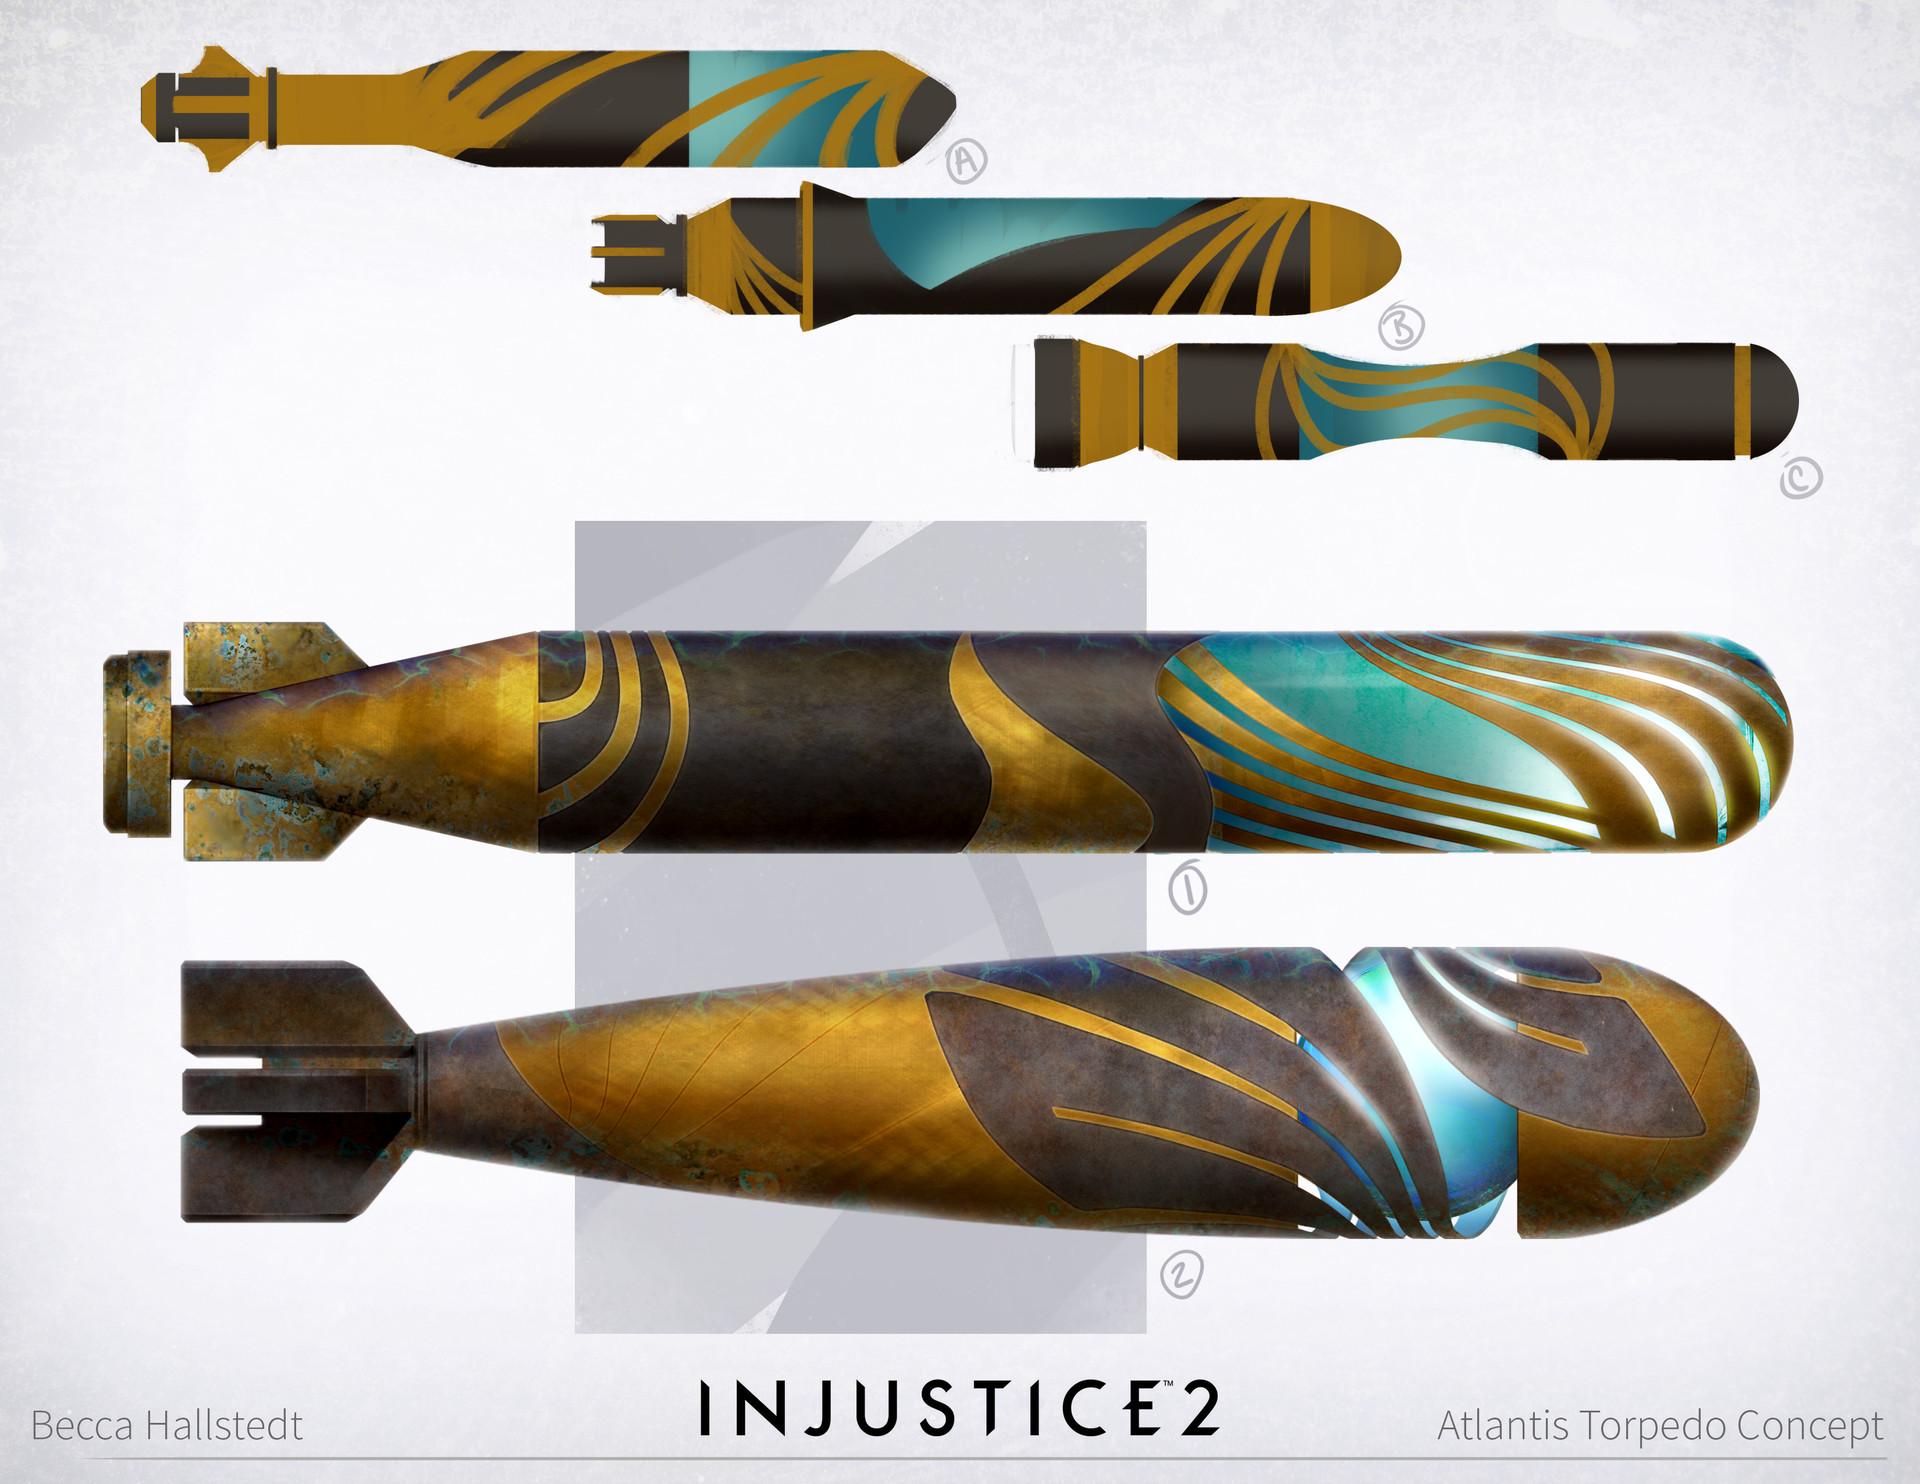 Torpedo concepts for the Atlantis level